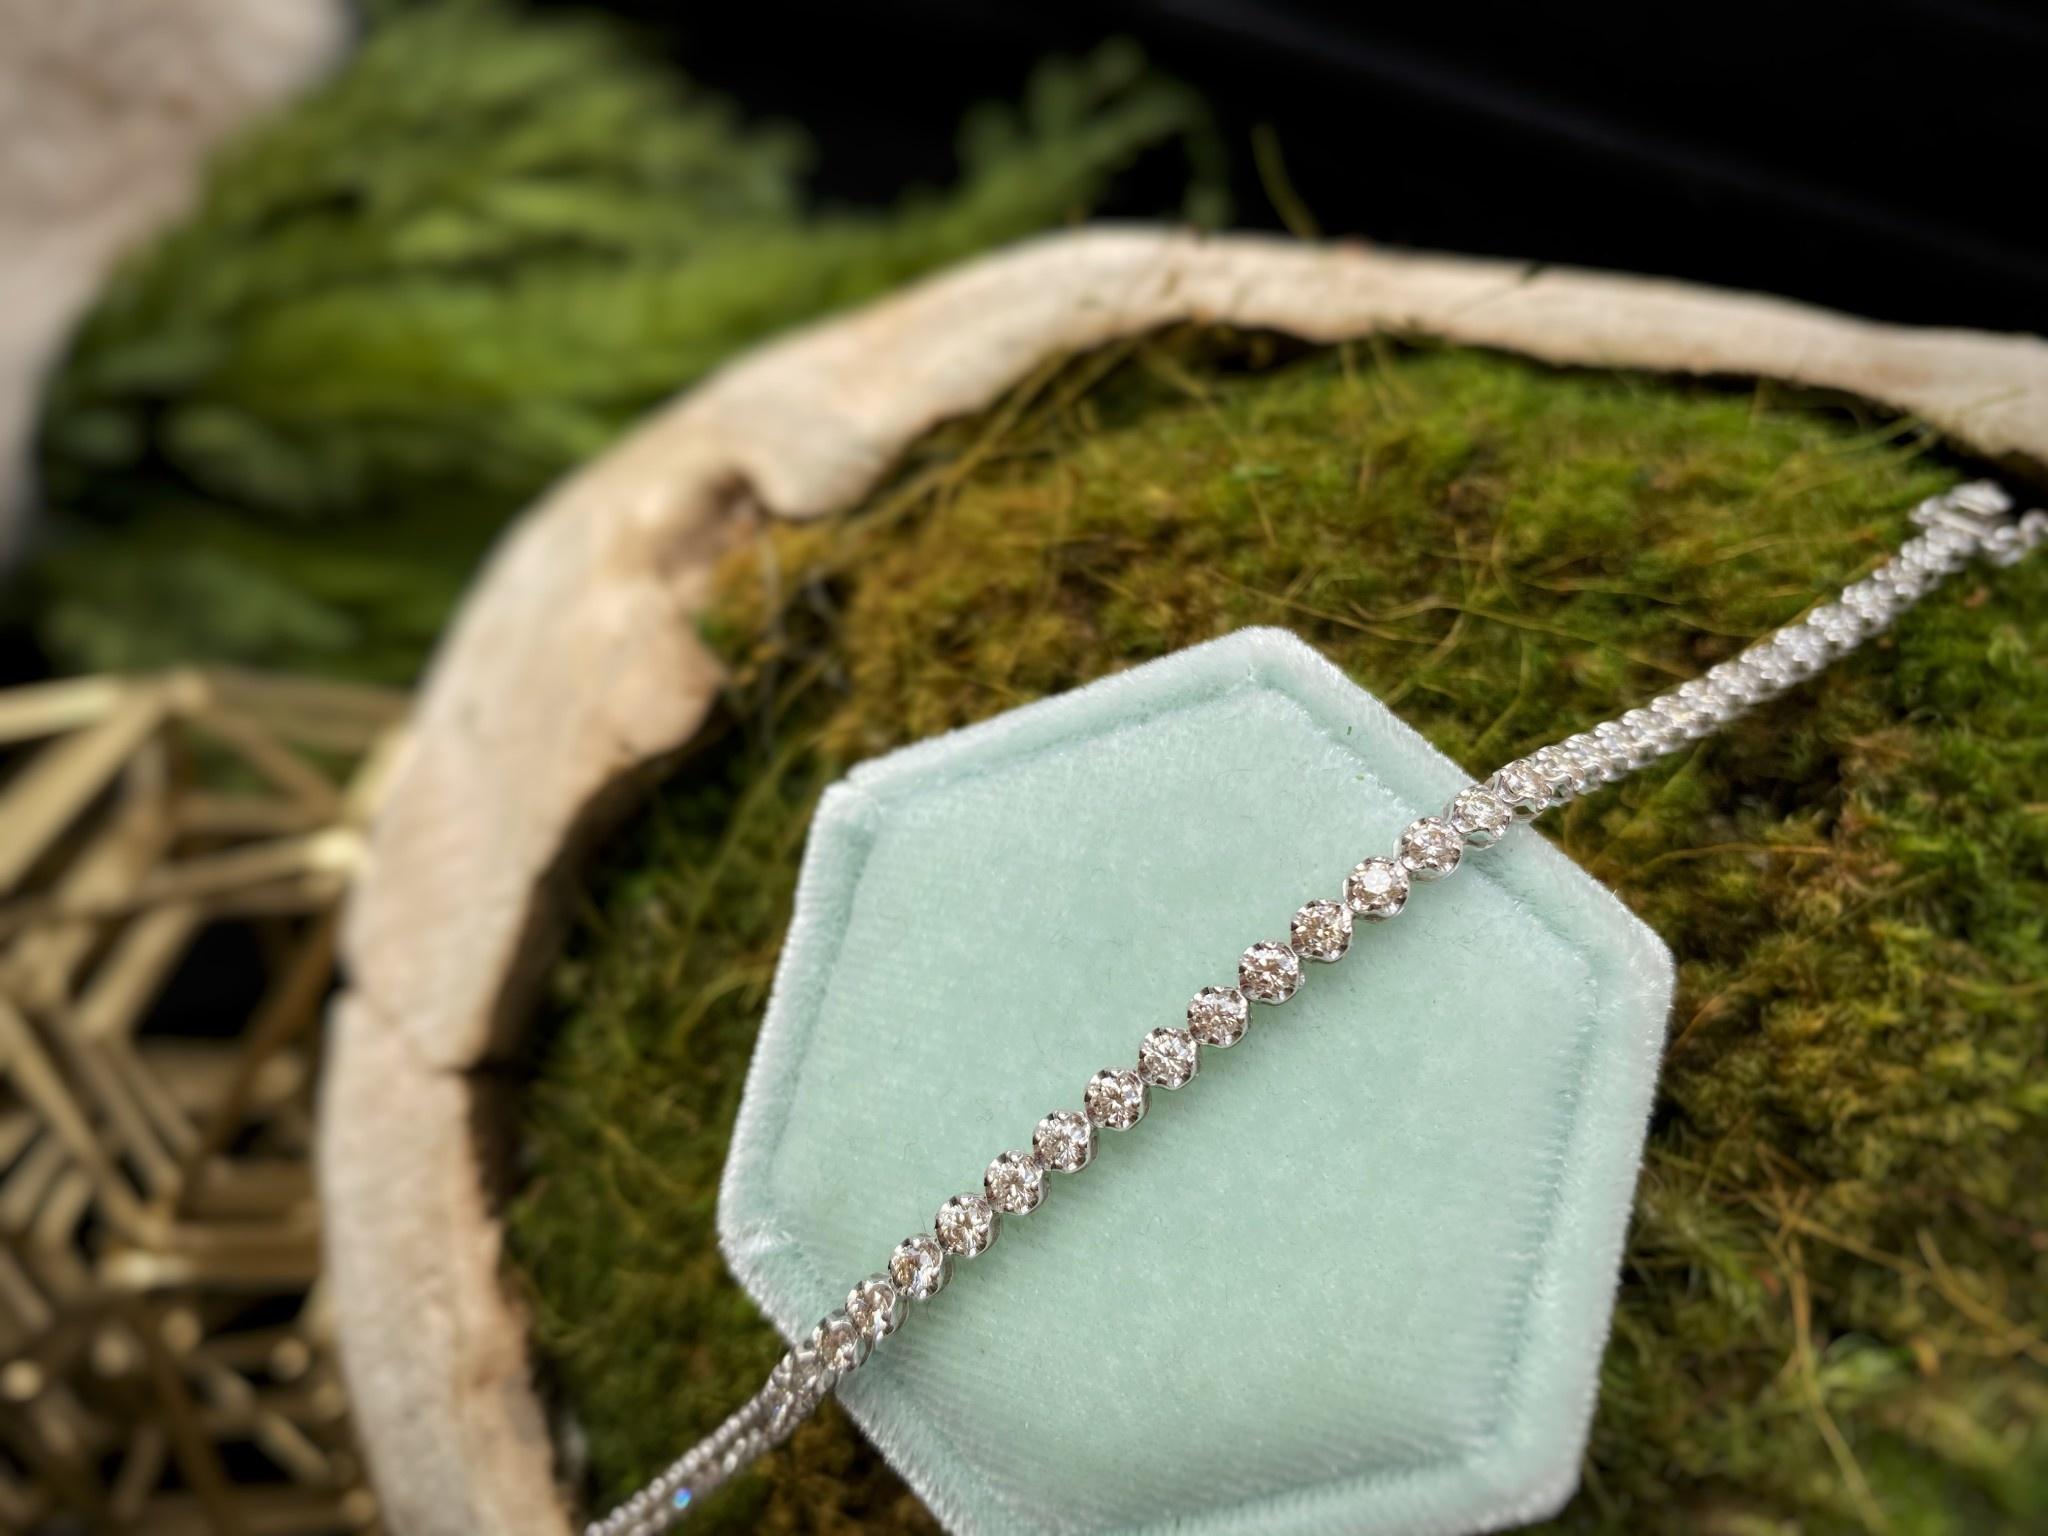 18k White Gold 2.0ct Diamond Tennis Bracelet